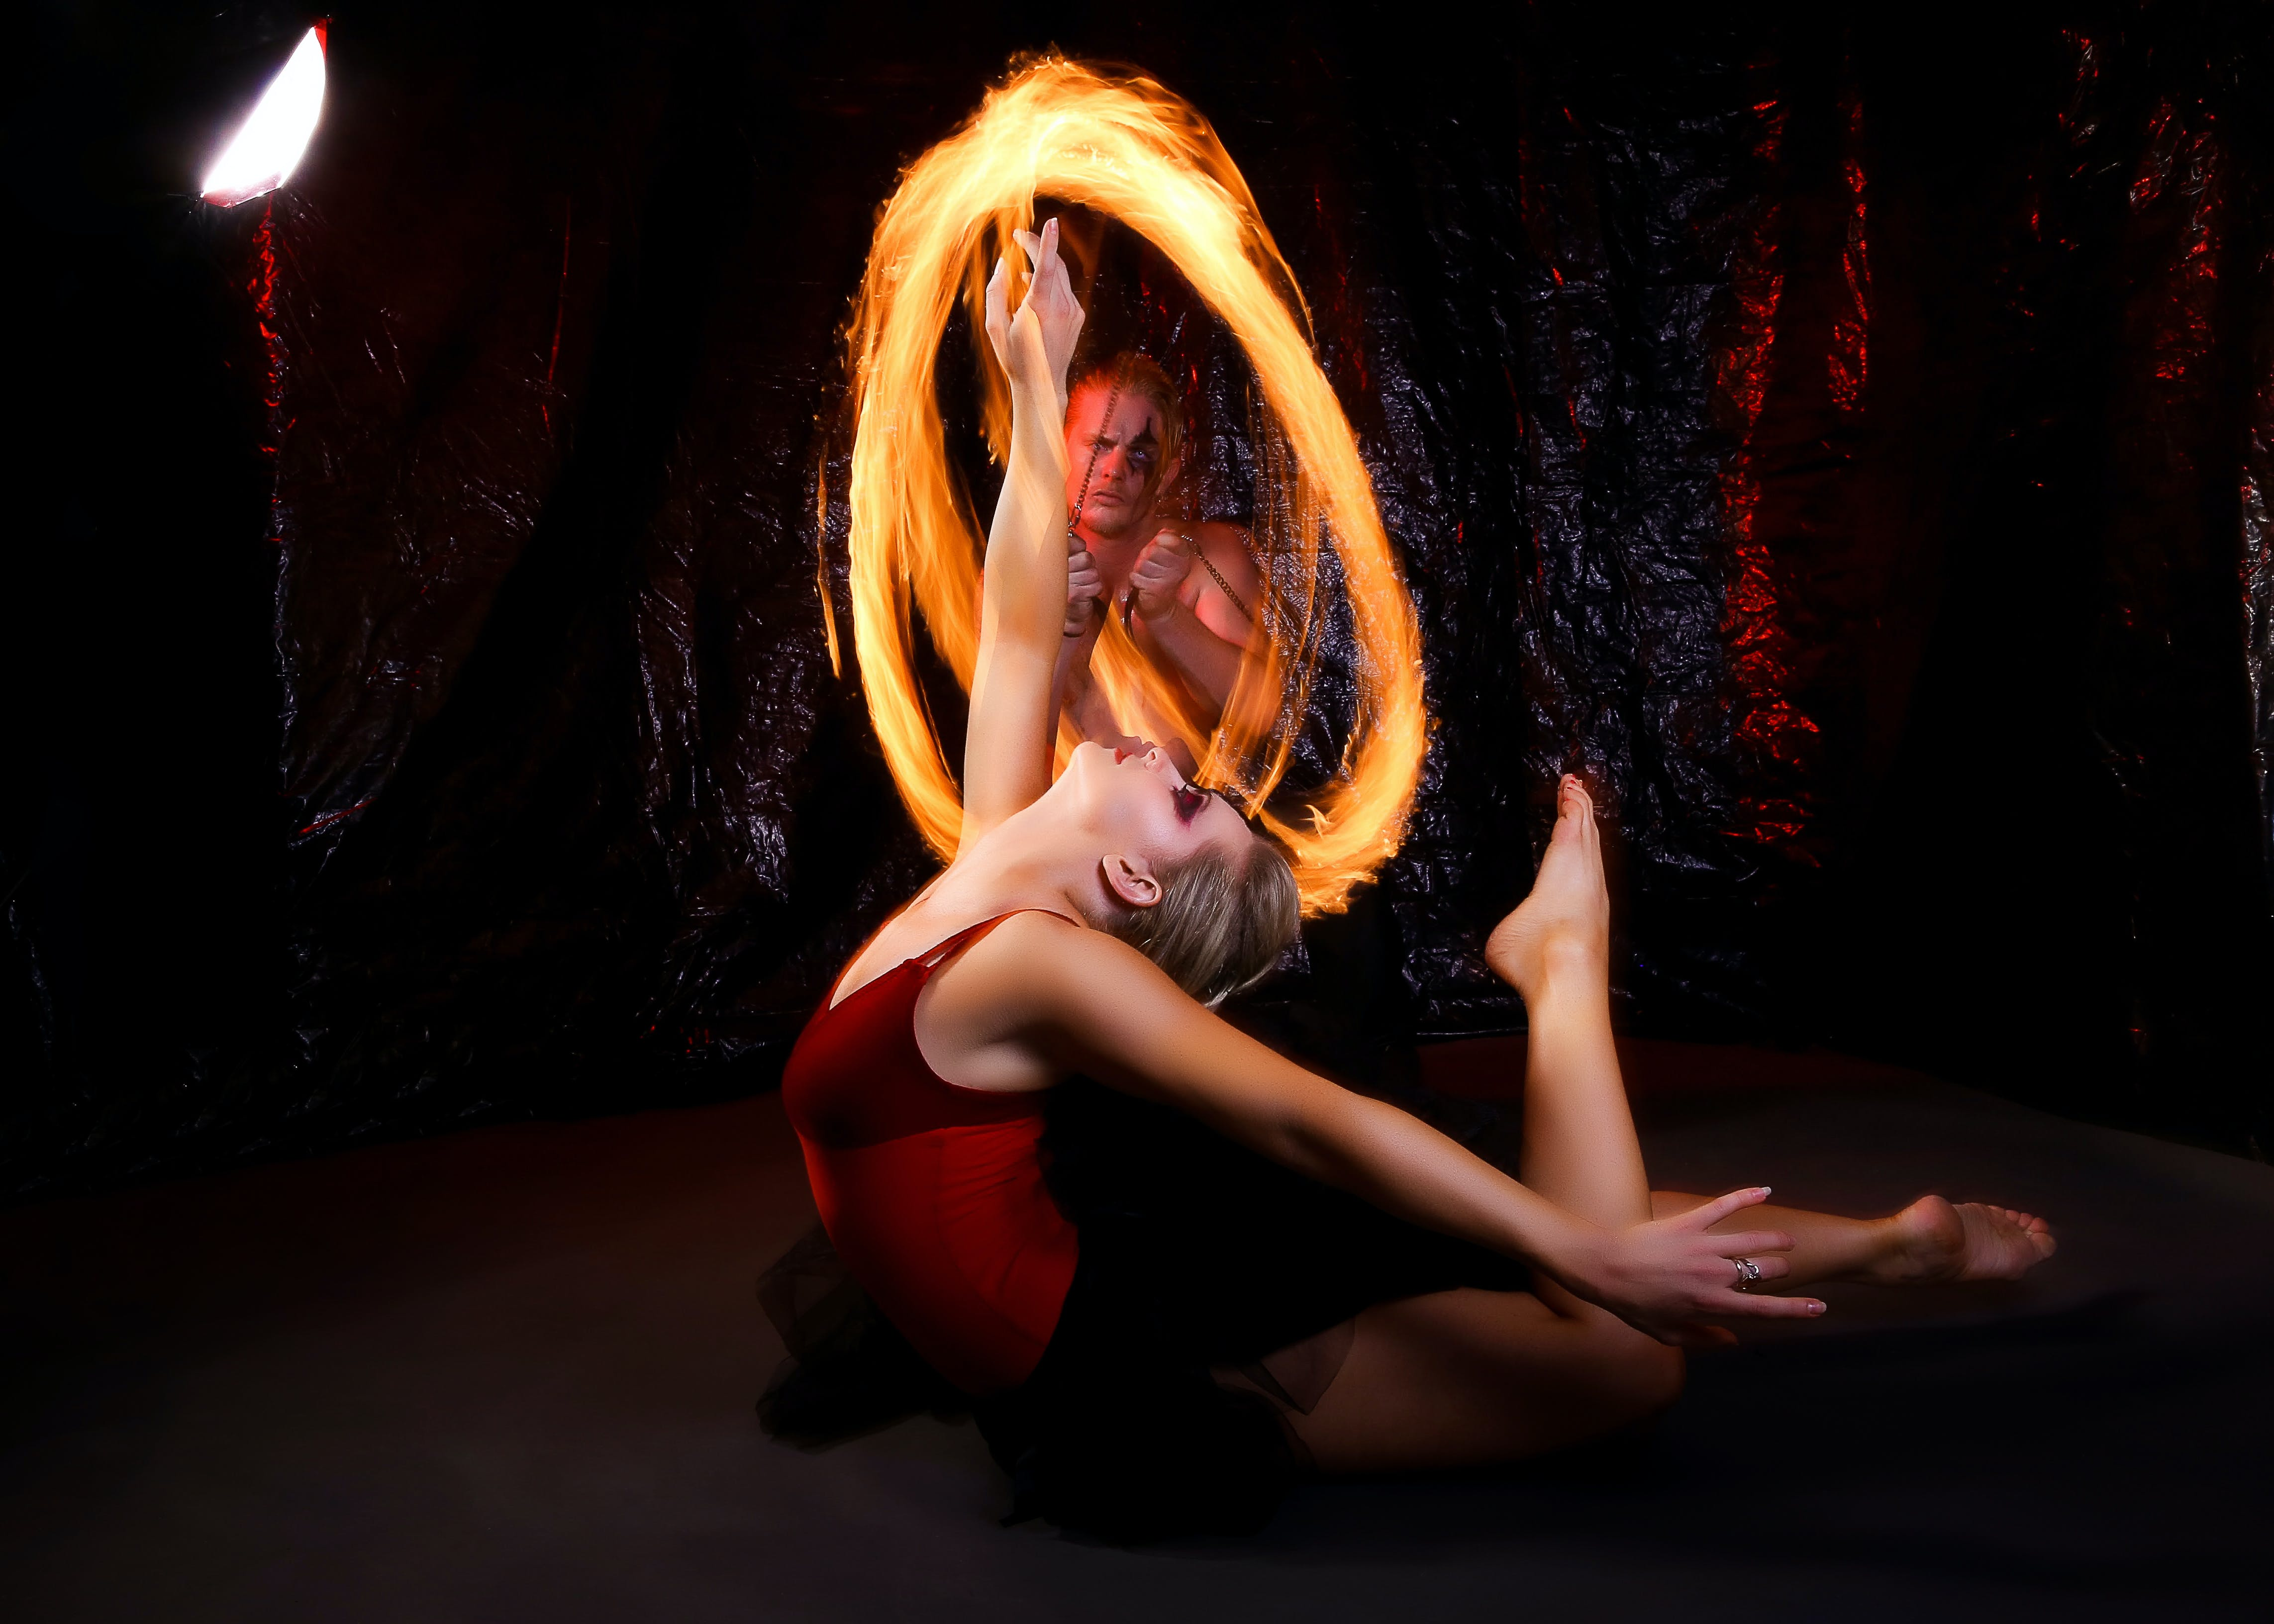 balletdanser, brand, dans